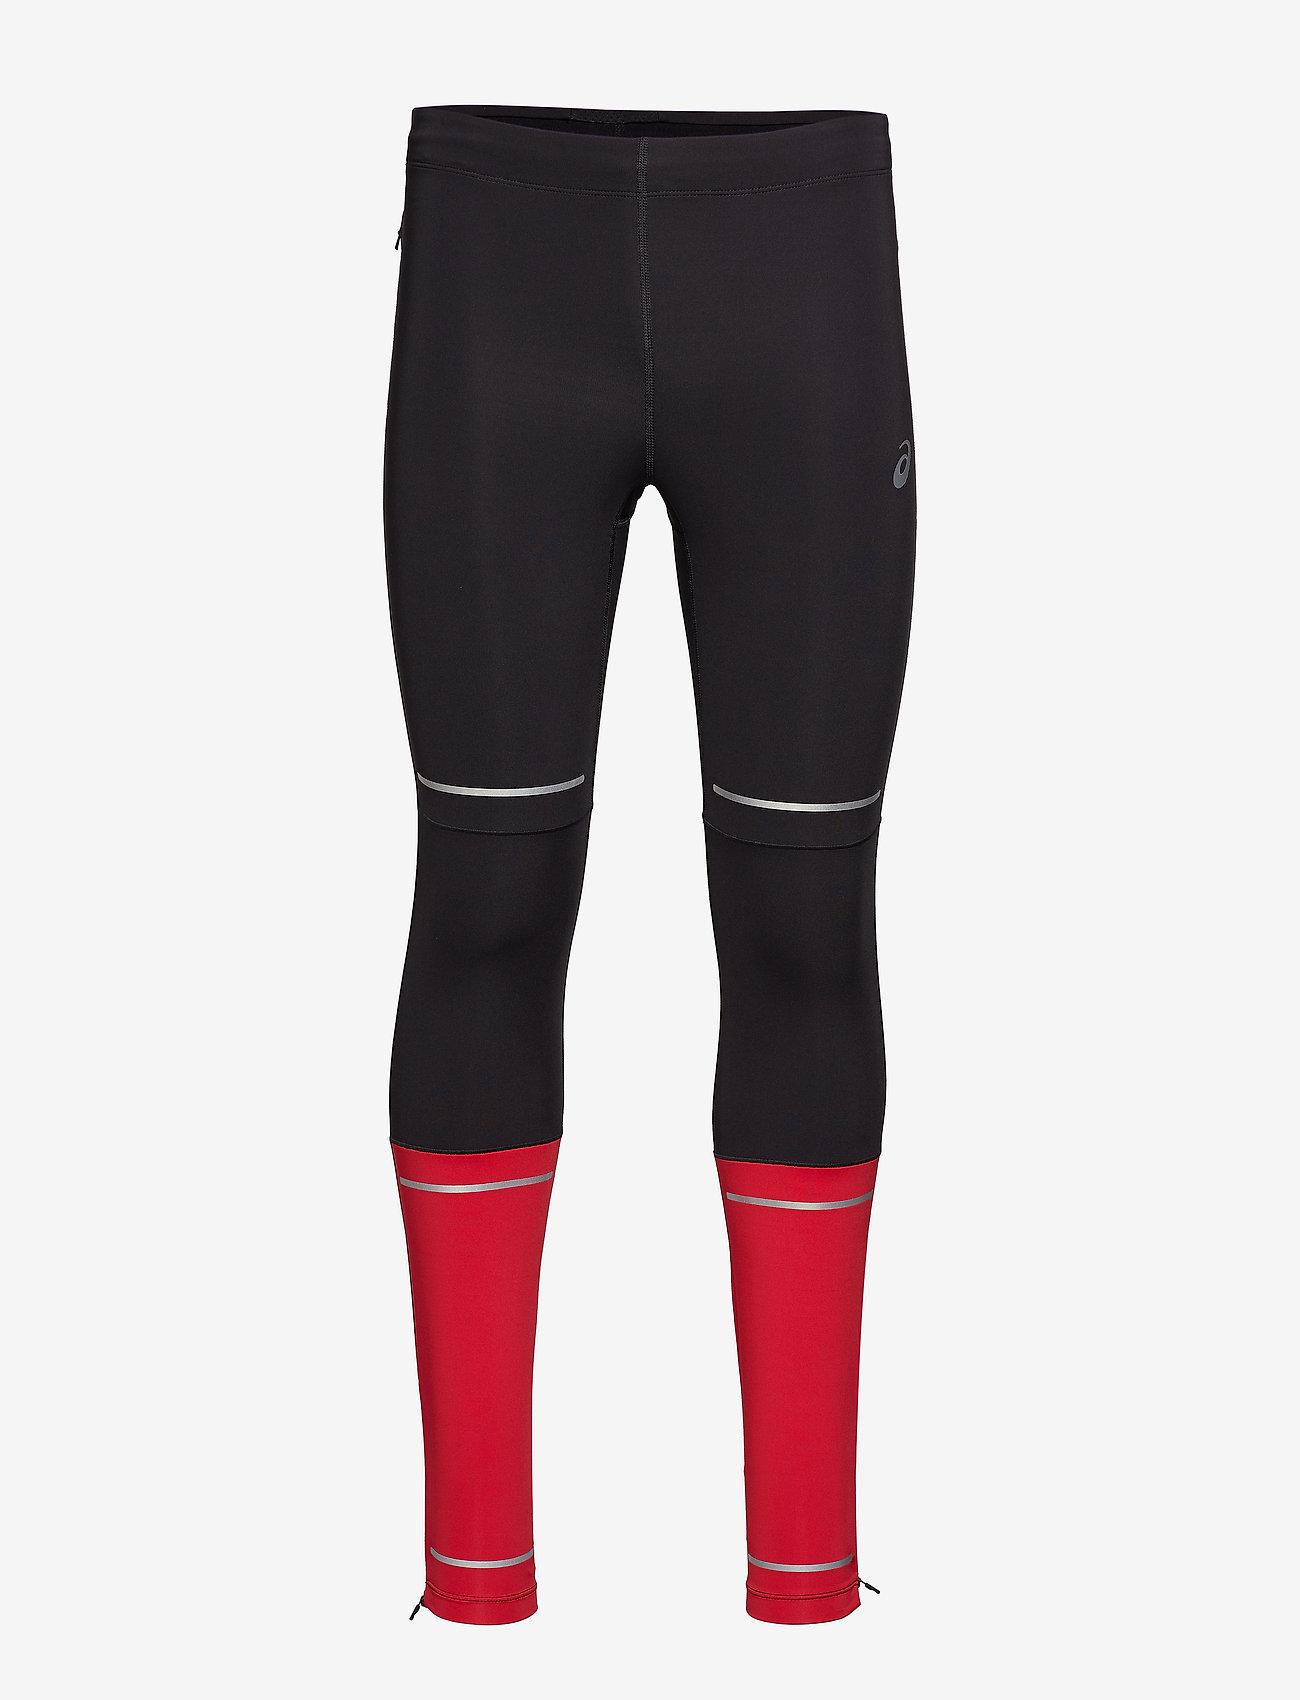 Asics - LITE-SHOW TIGHT - running & training tights - performance black/samba - 0